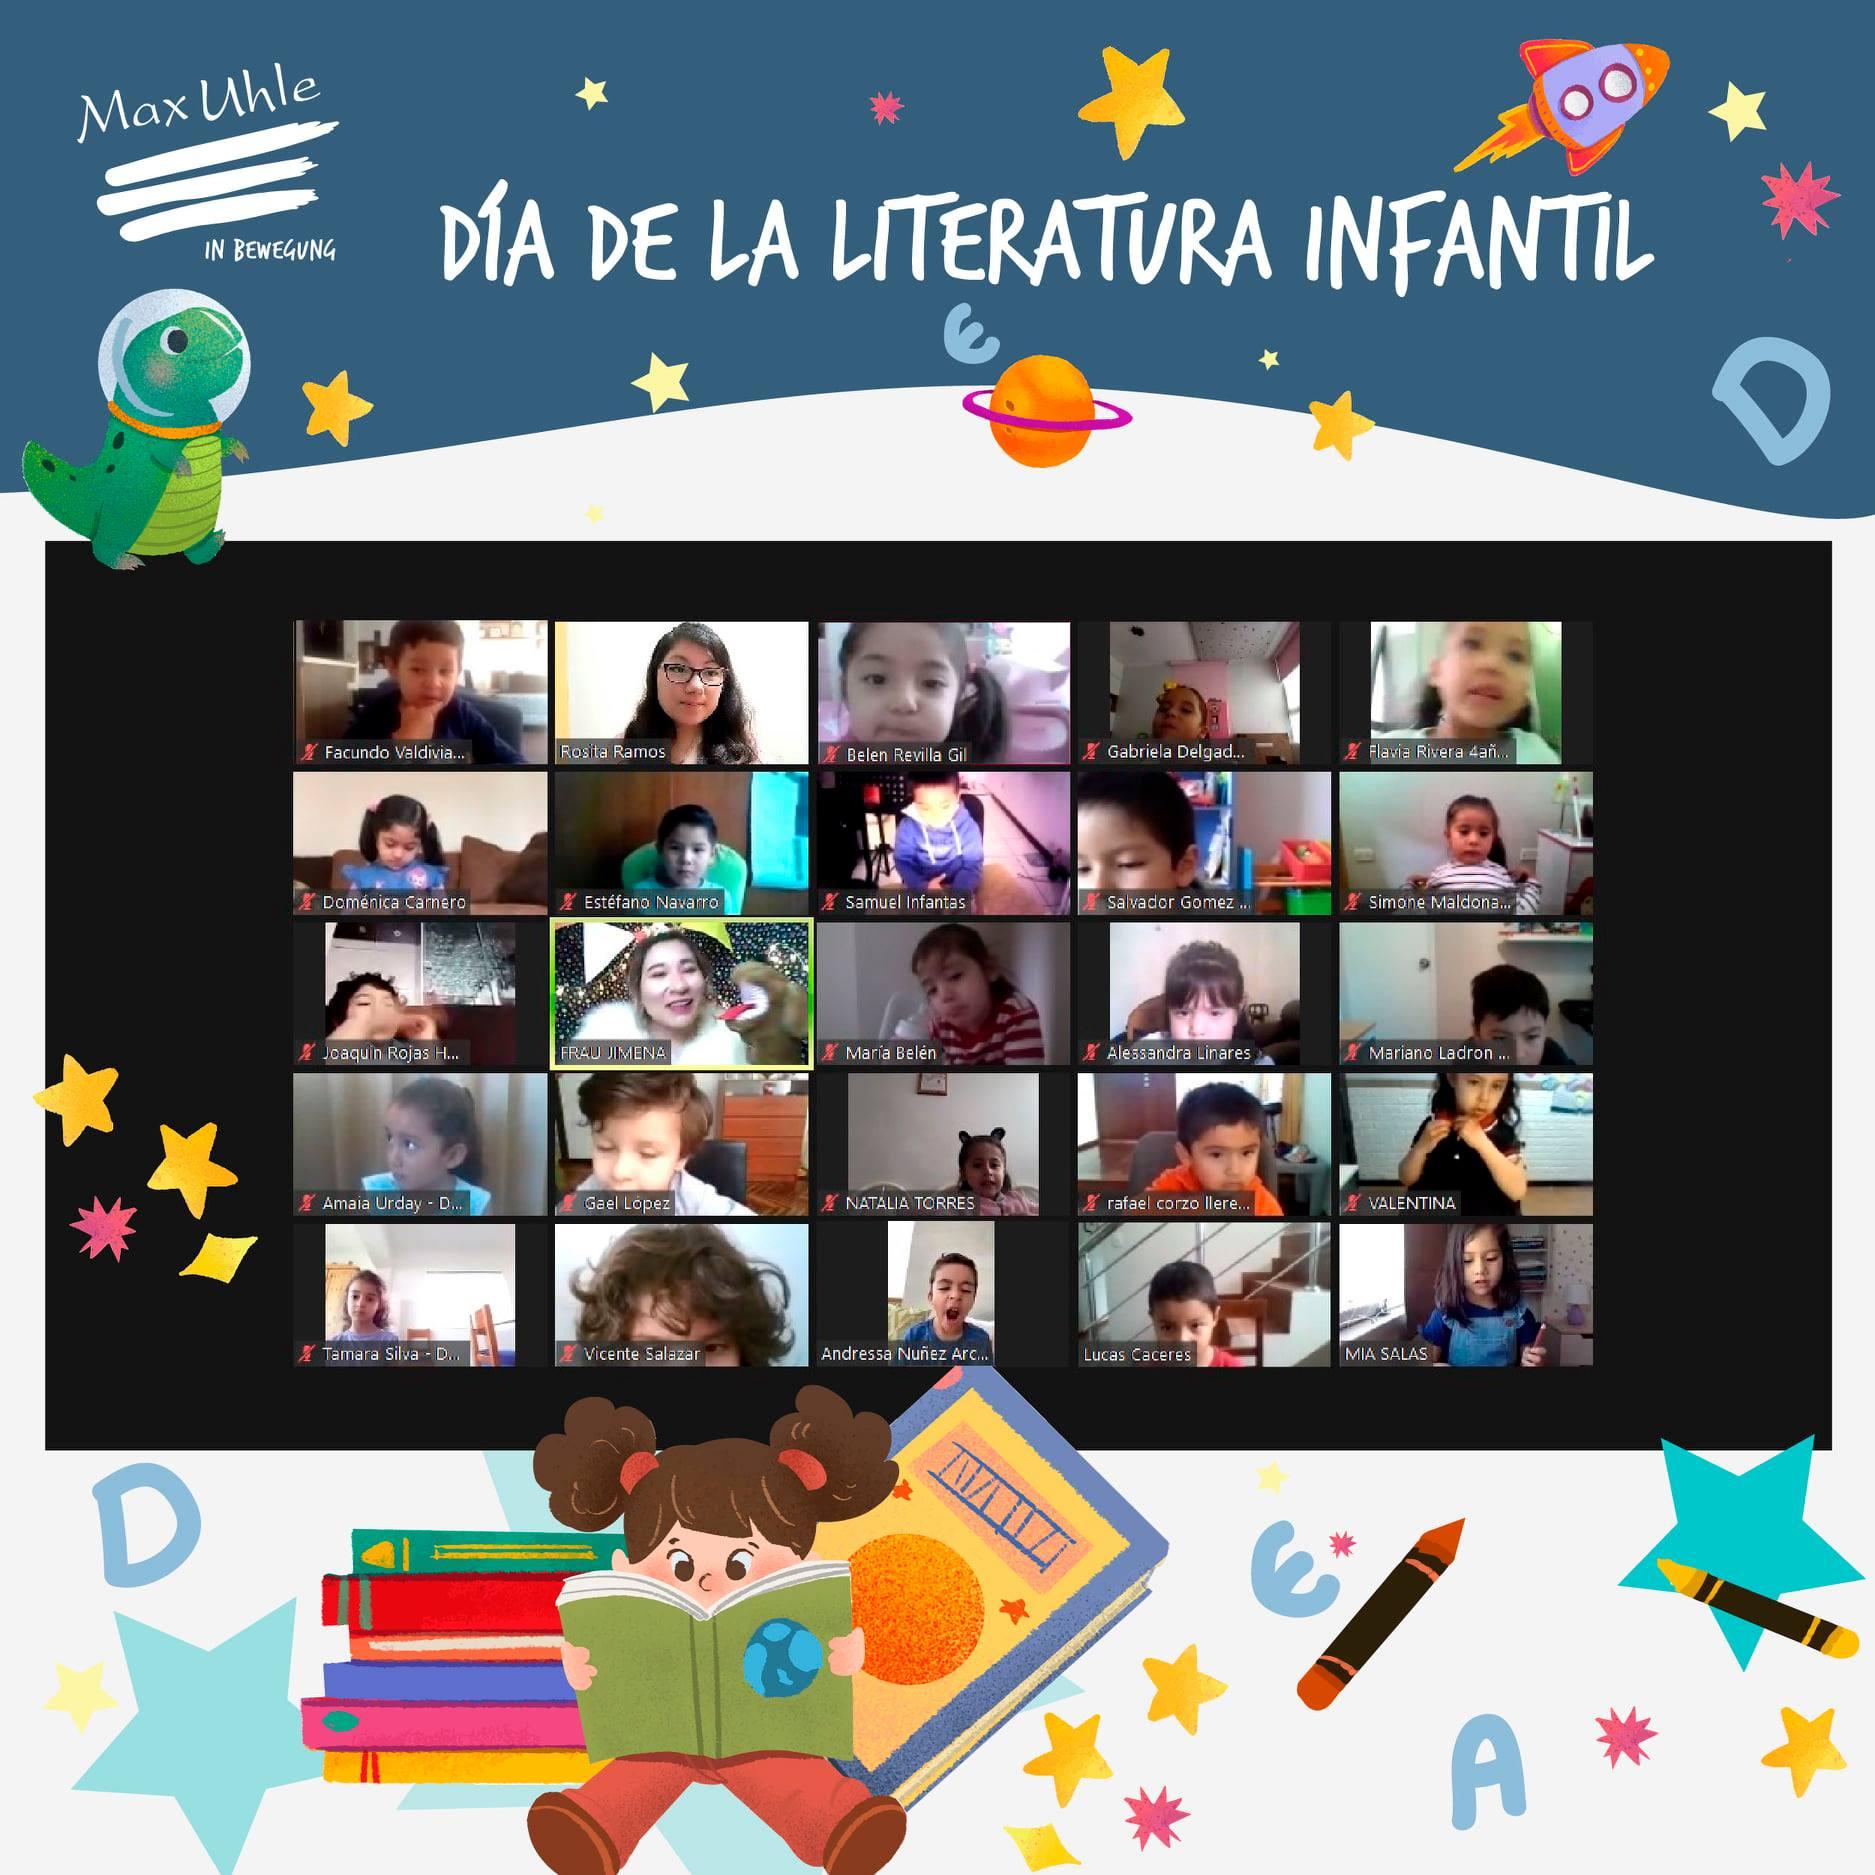 dia de la literatura infantil colegio peruano aleman max uhle